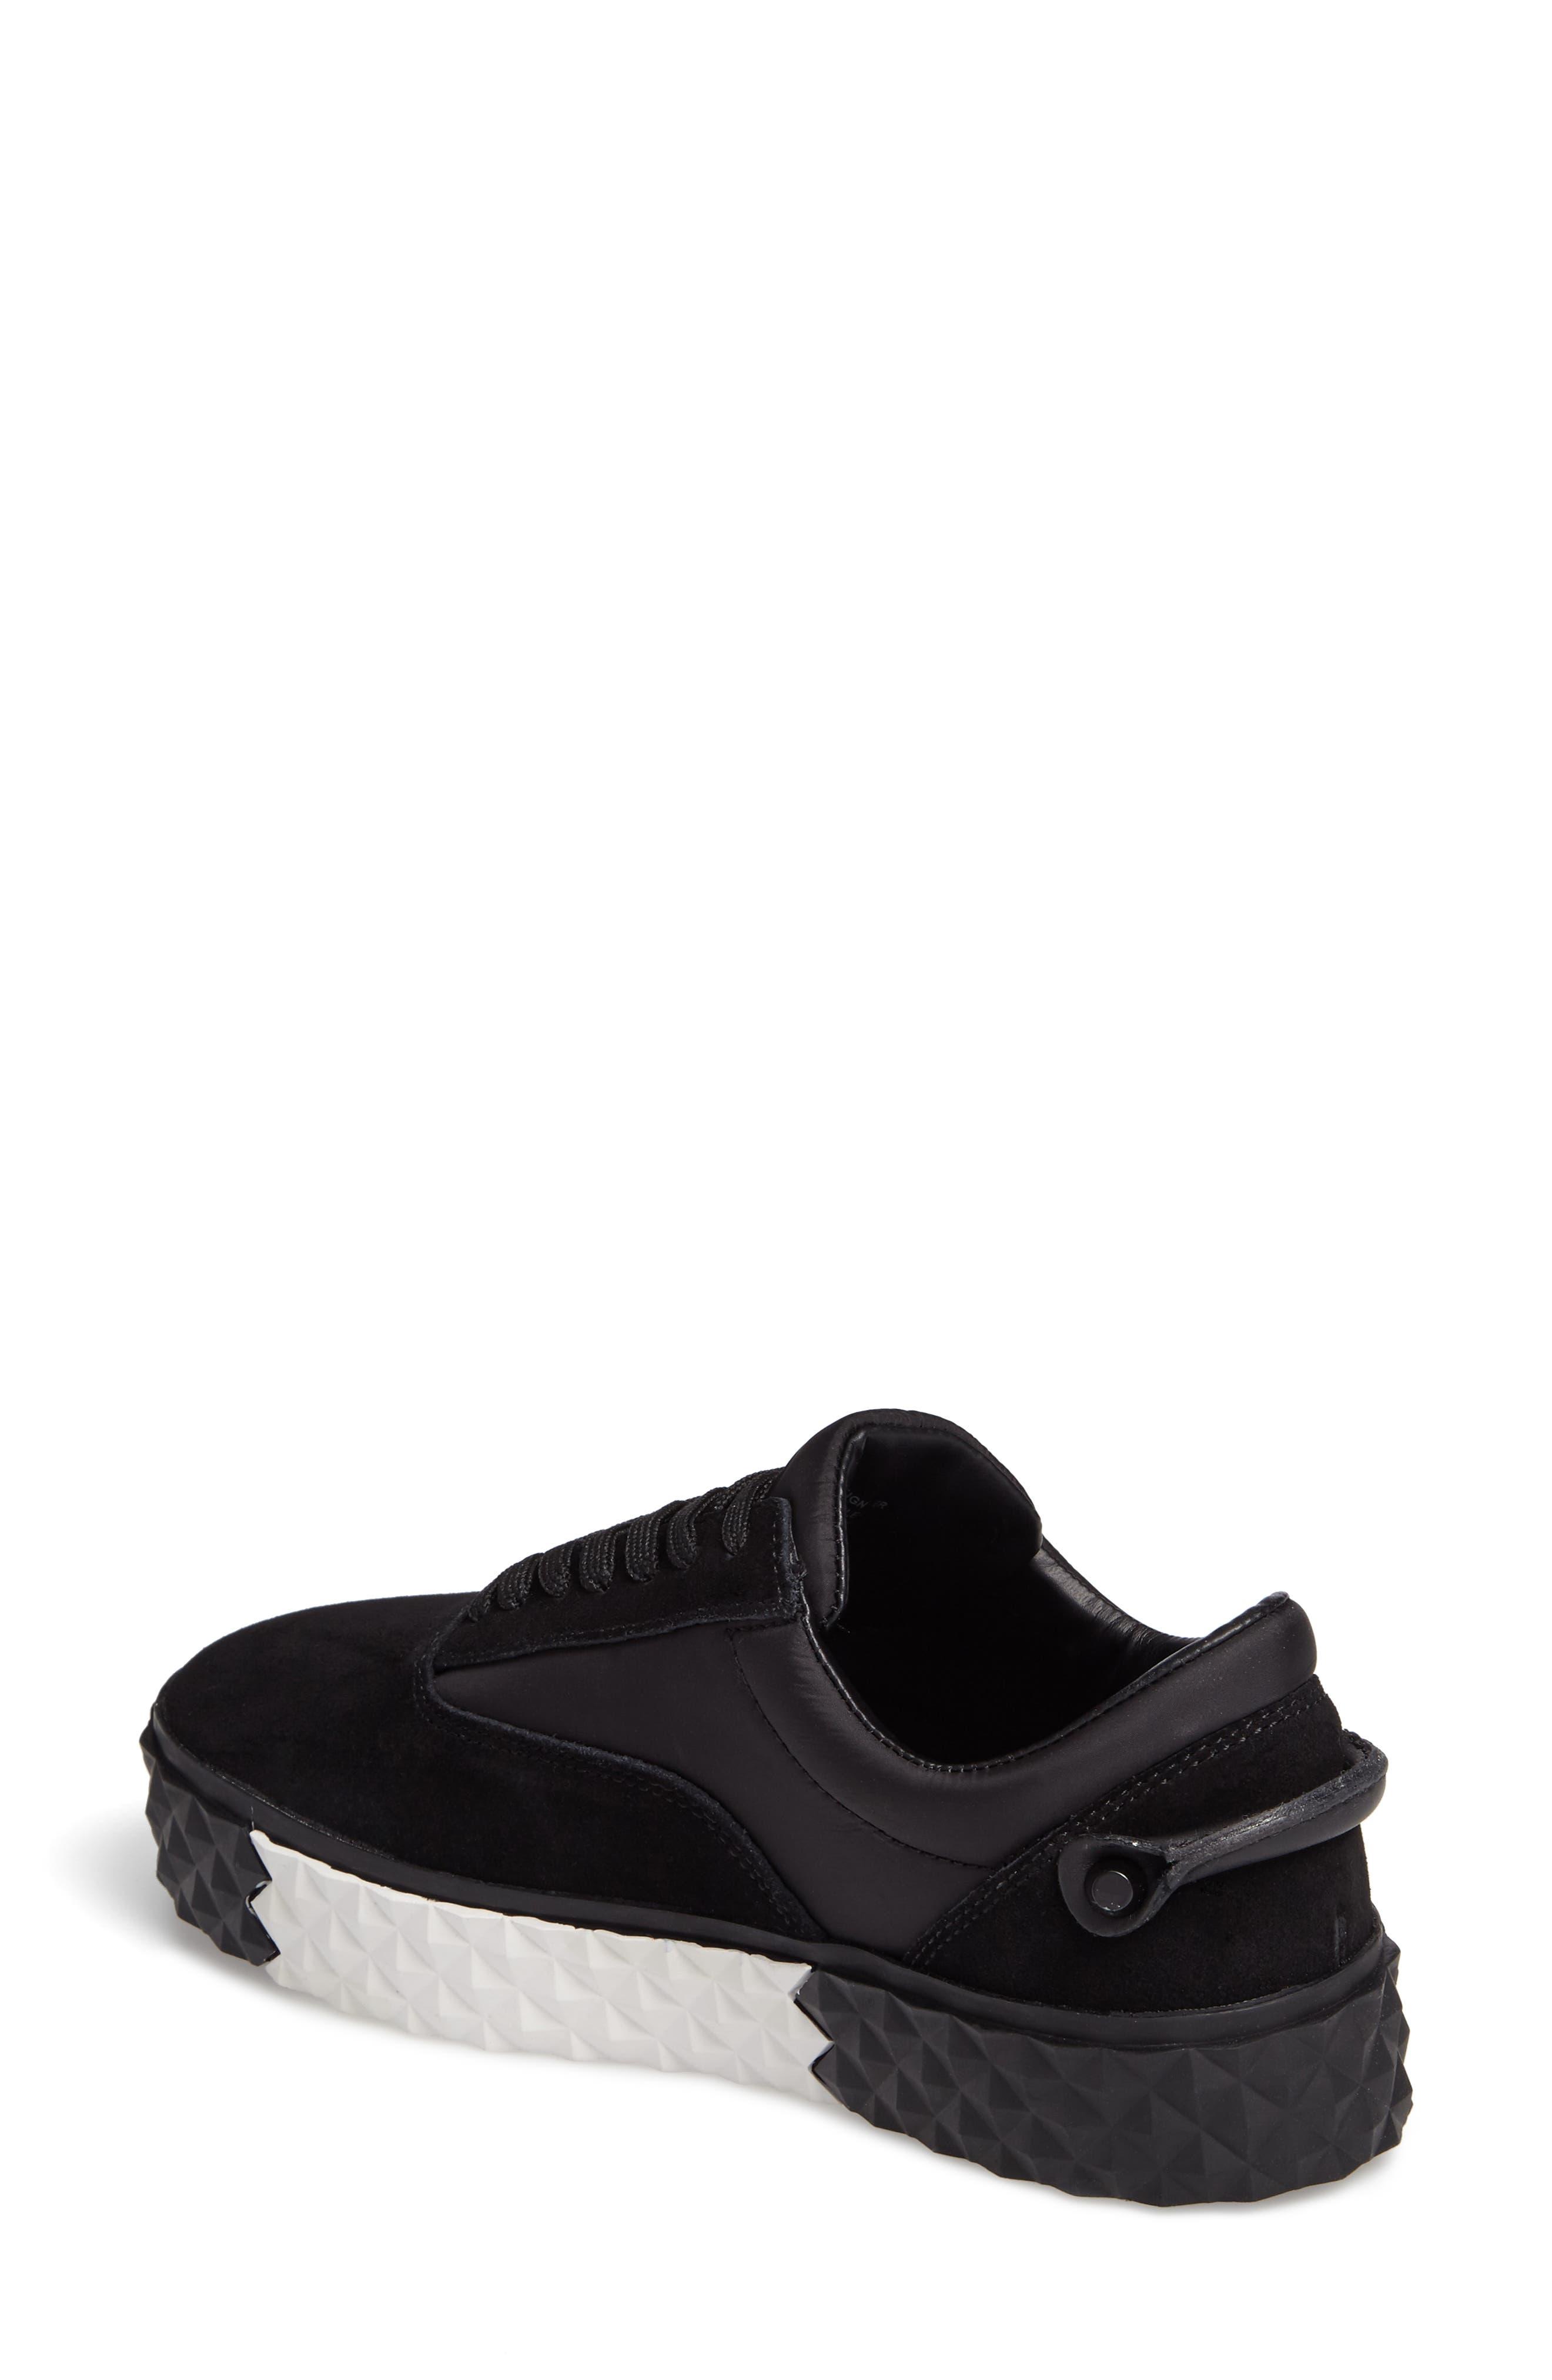 Reign Platform Sneaker,                             Alternate thumbnail 2, color,                             005